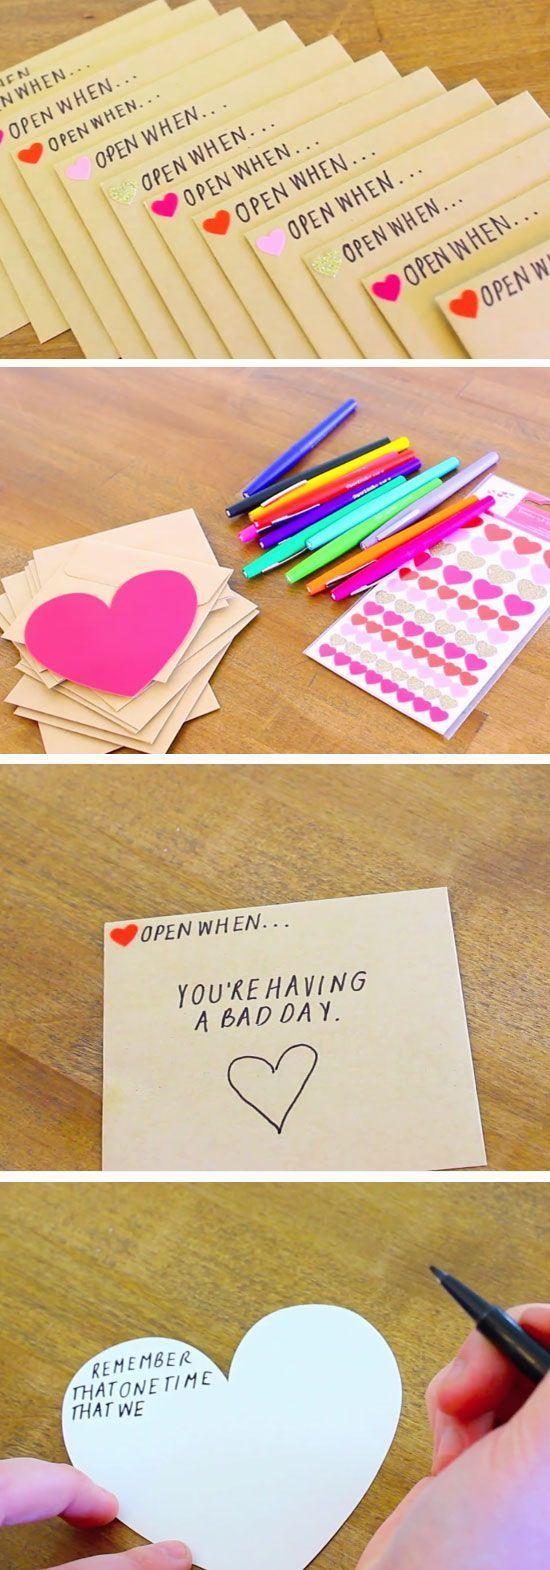 Regalos De San Valentin Para Mi Novio Manualidades.Manualidades Para Mi Novio 8 Propuestas Para Regalar 1001